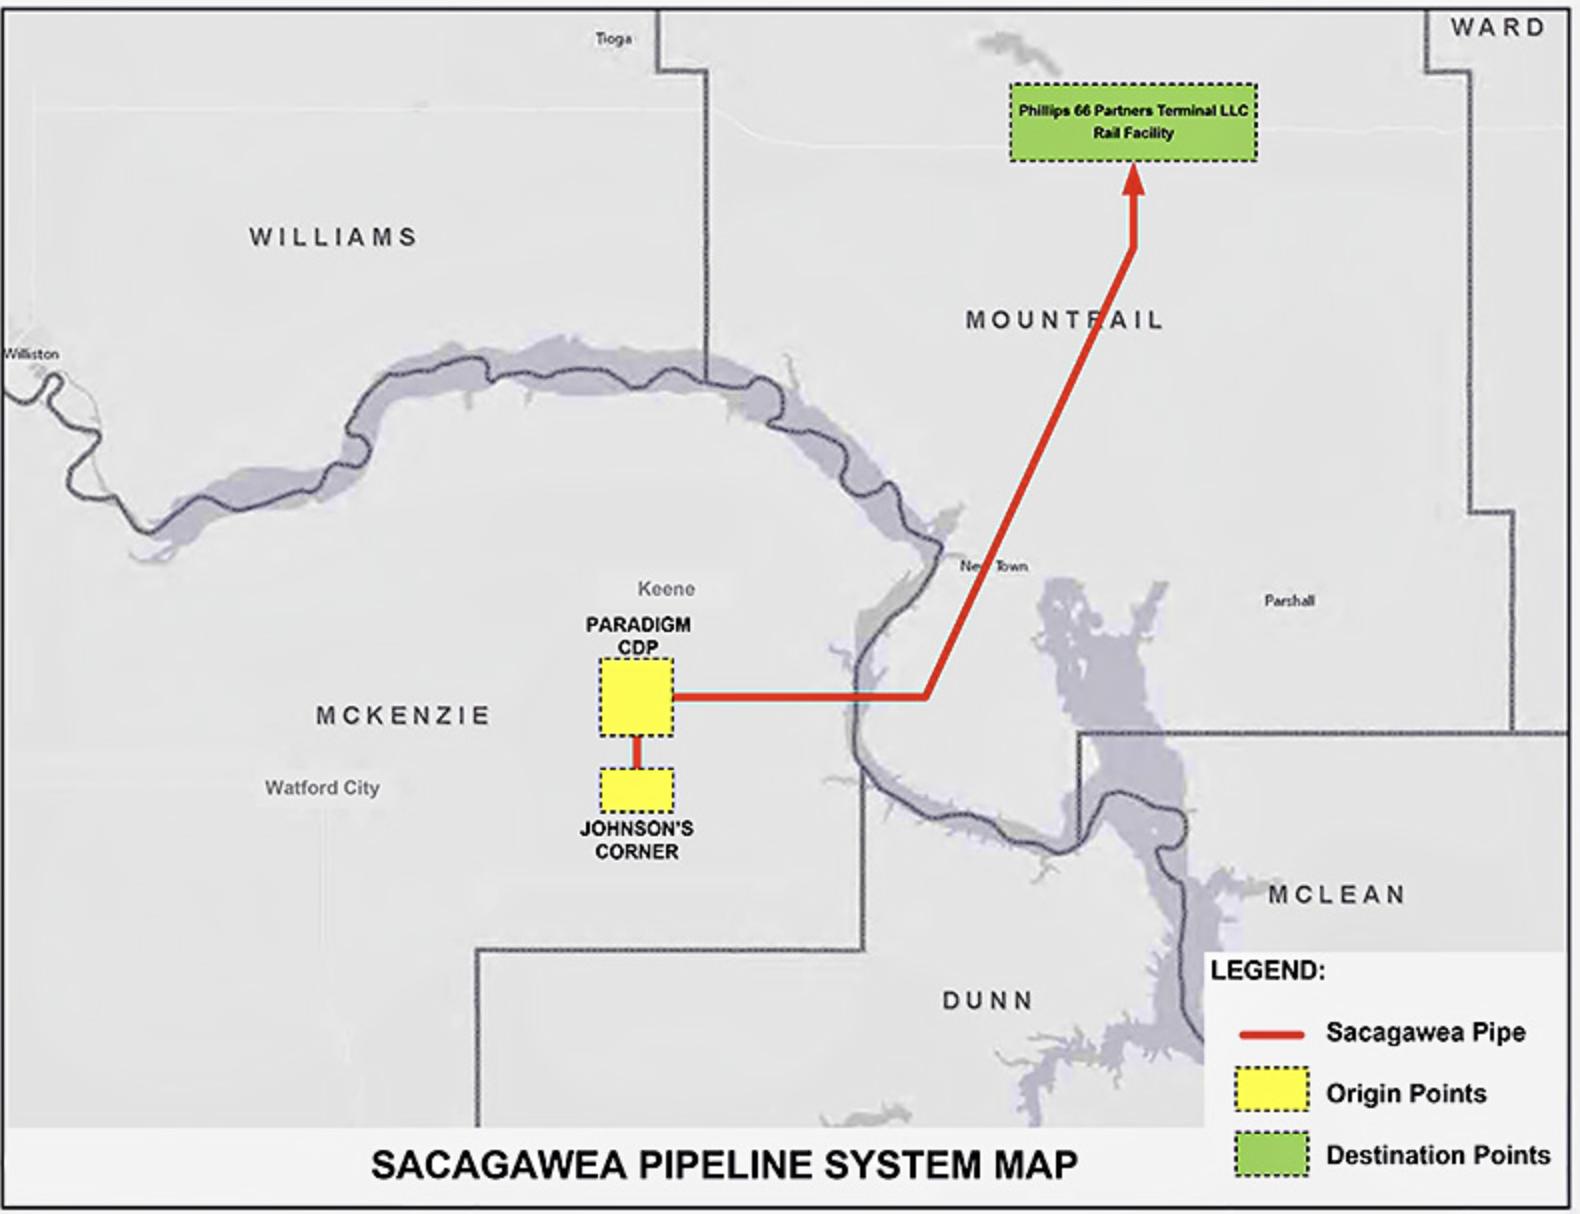 Sacagawea Pipeline map